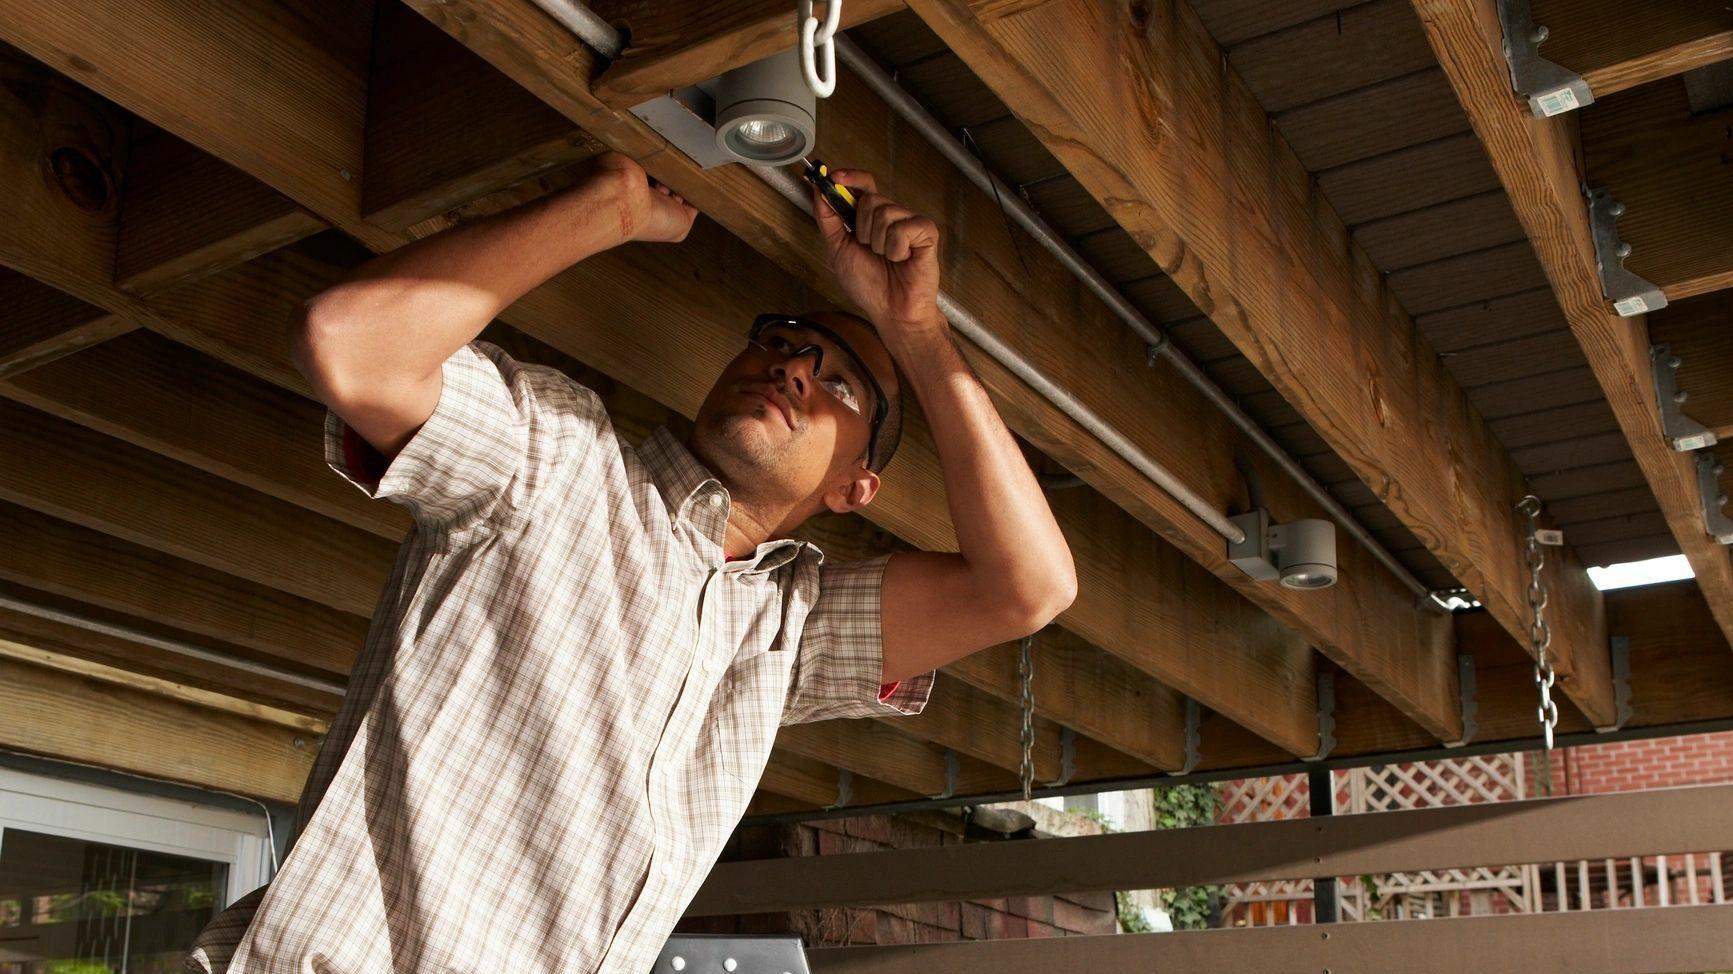 Man fixing ceiling joists